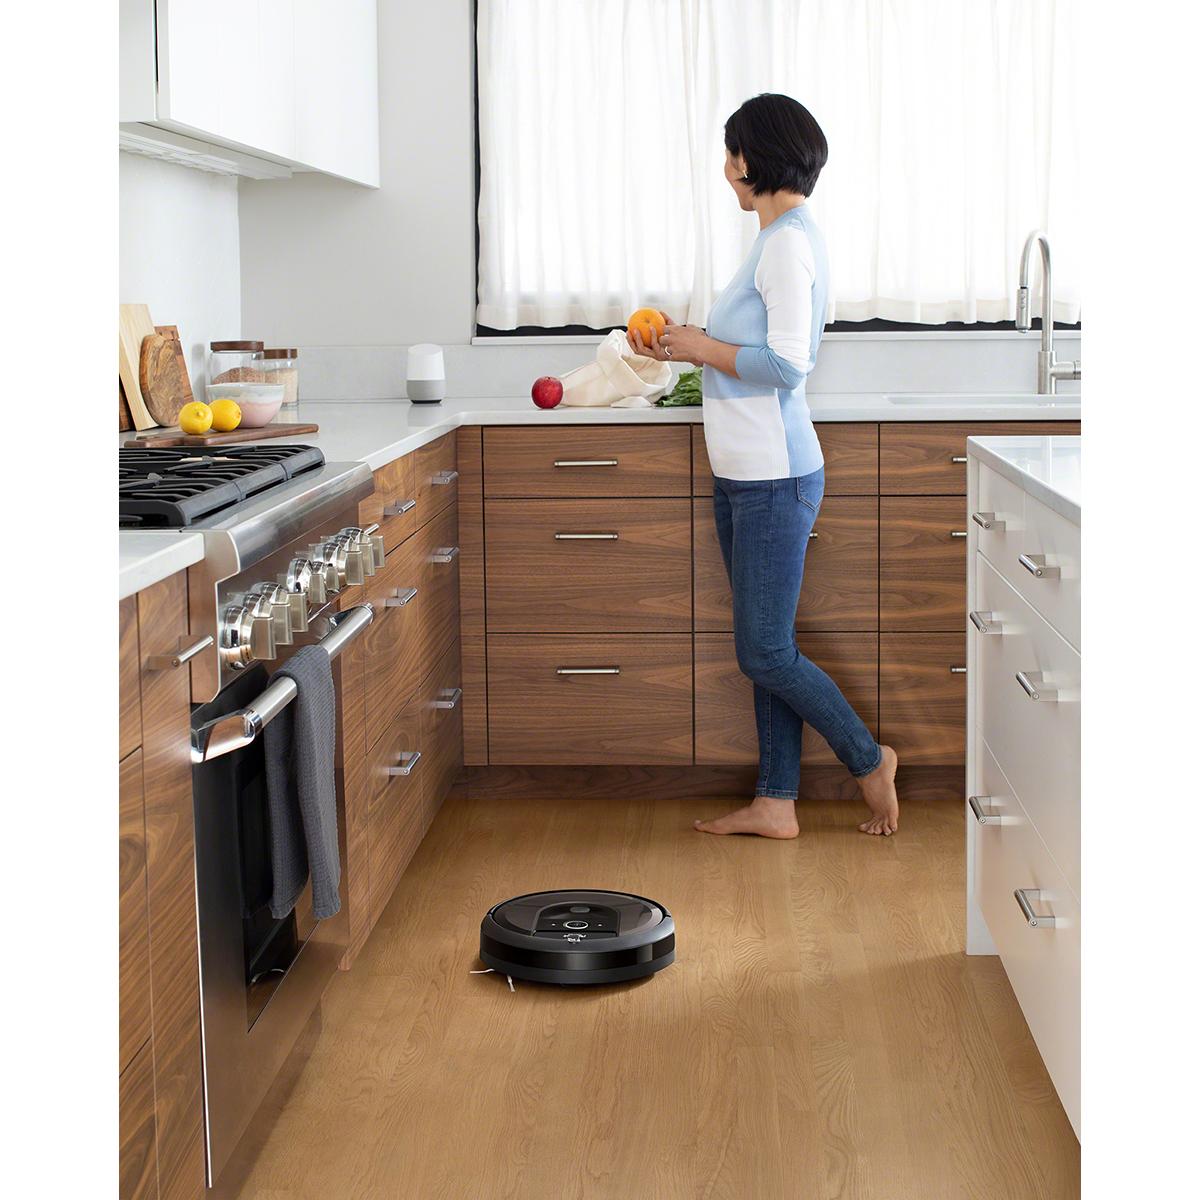 i7_i7-_Charcoal_Photo_Lifestyle_GoogleHome_Kitchen